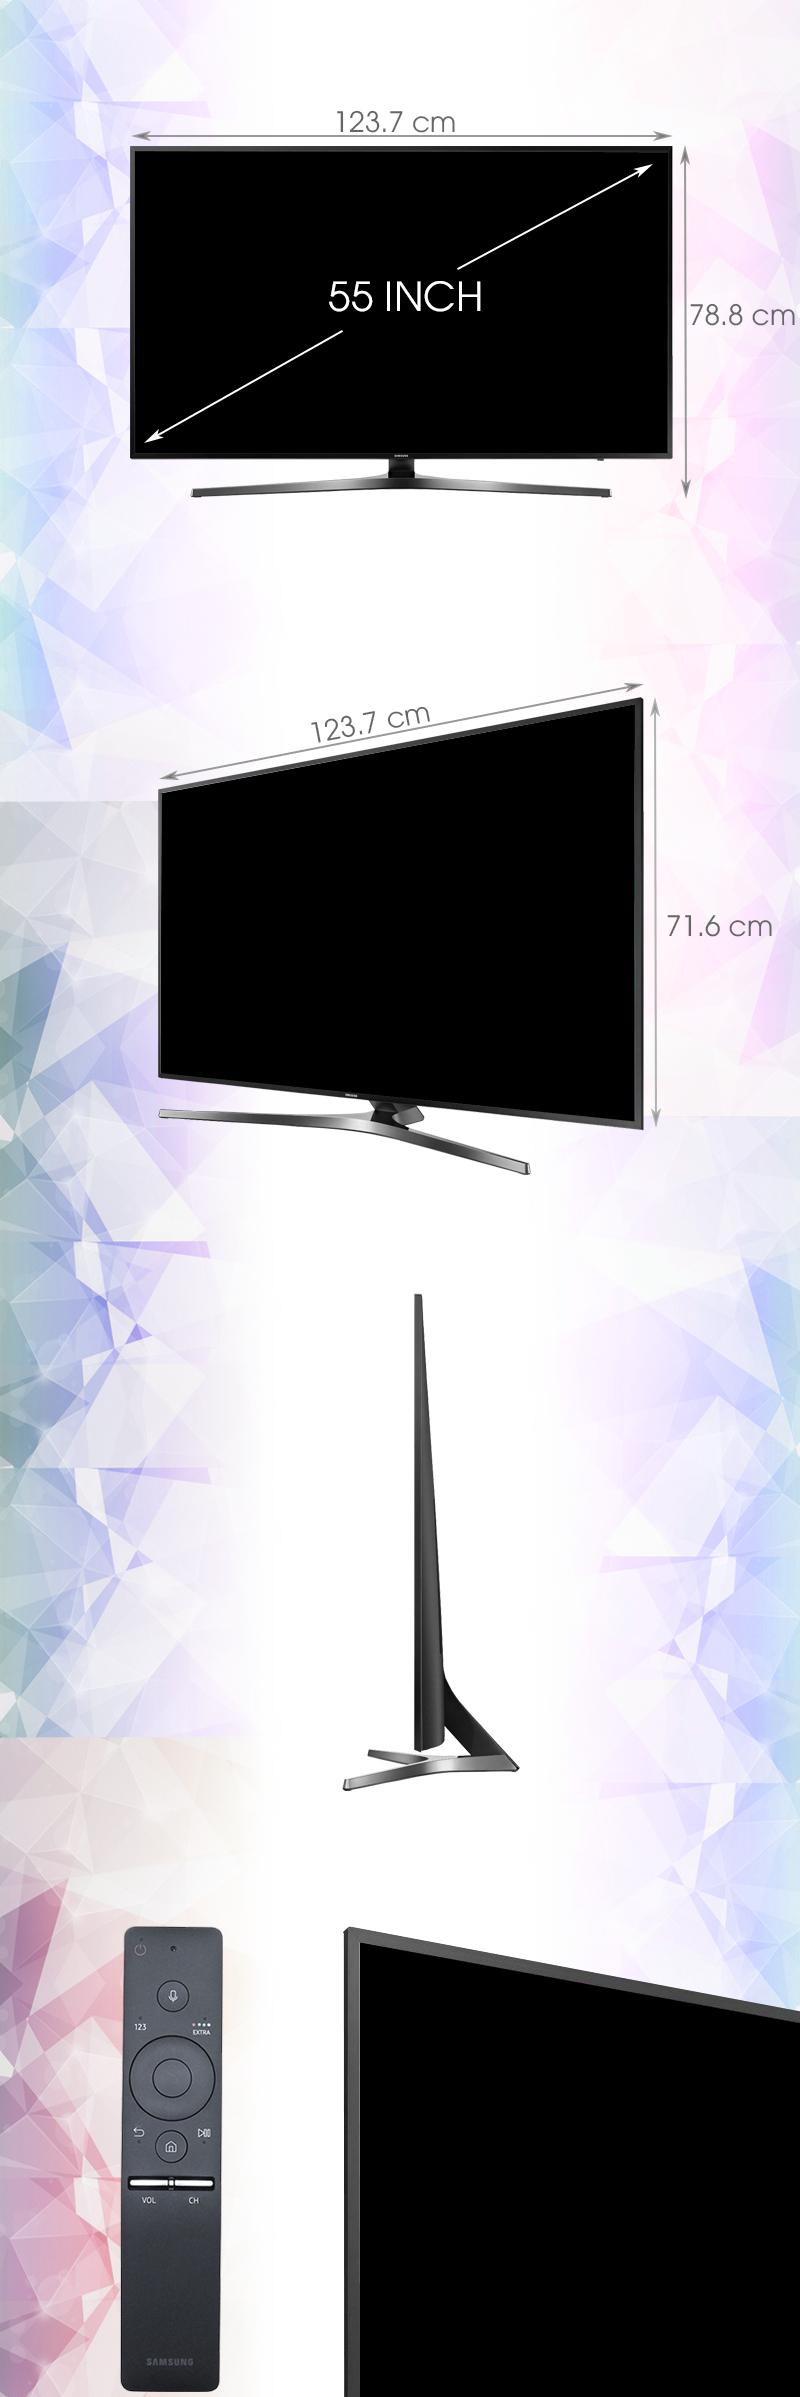 Smart Tivi Samsung 55 inch UA55KU6400 - Kích thước tivi